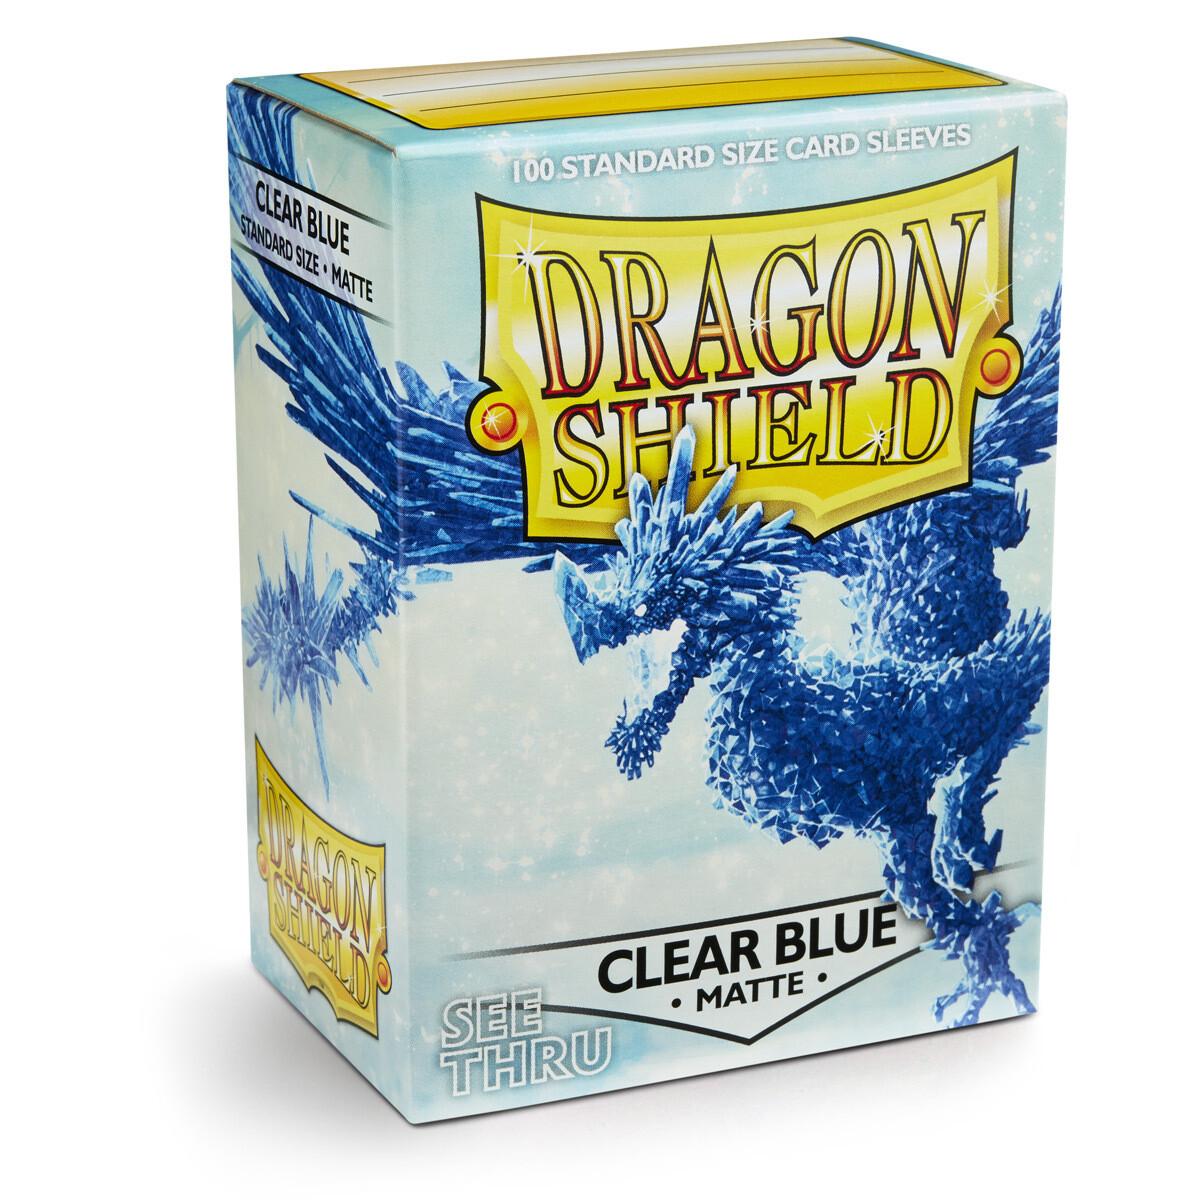 Dragon Shield 100 Sleeves - Matte Clear Blue